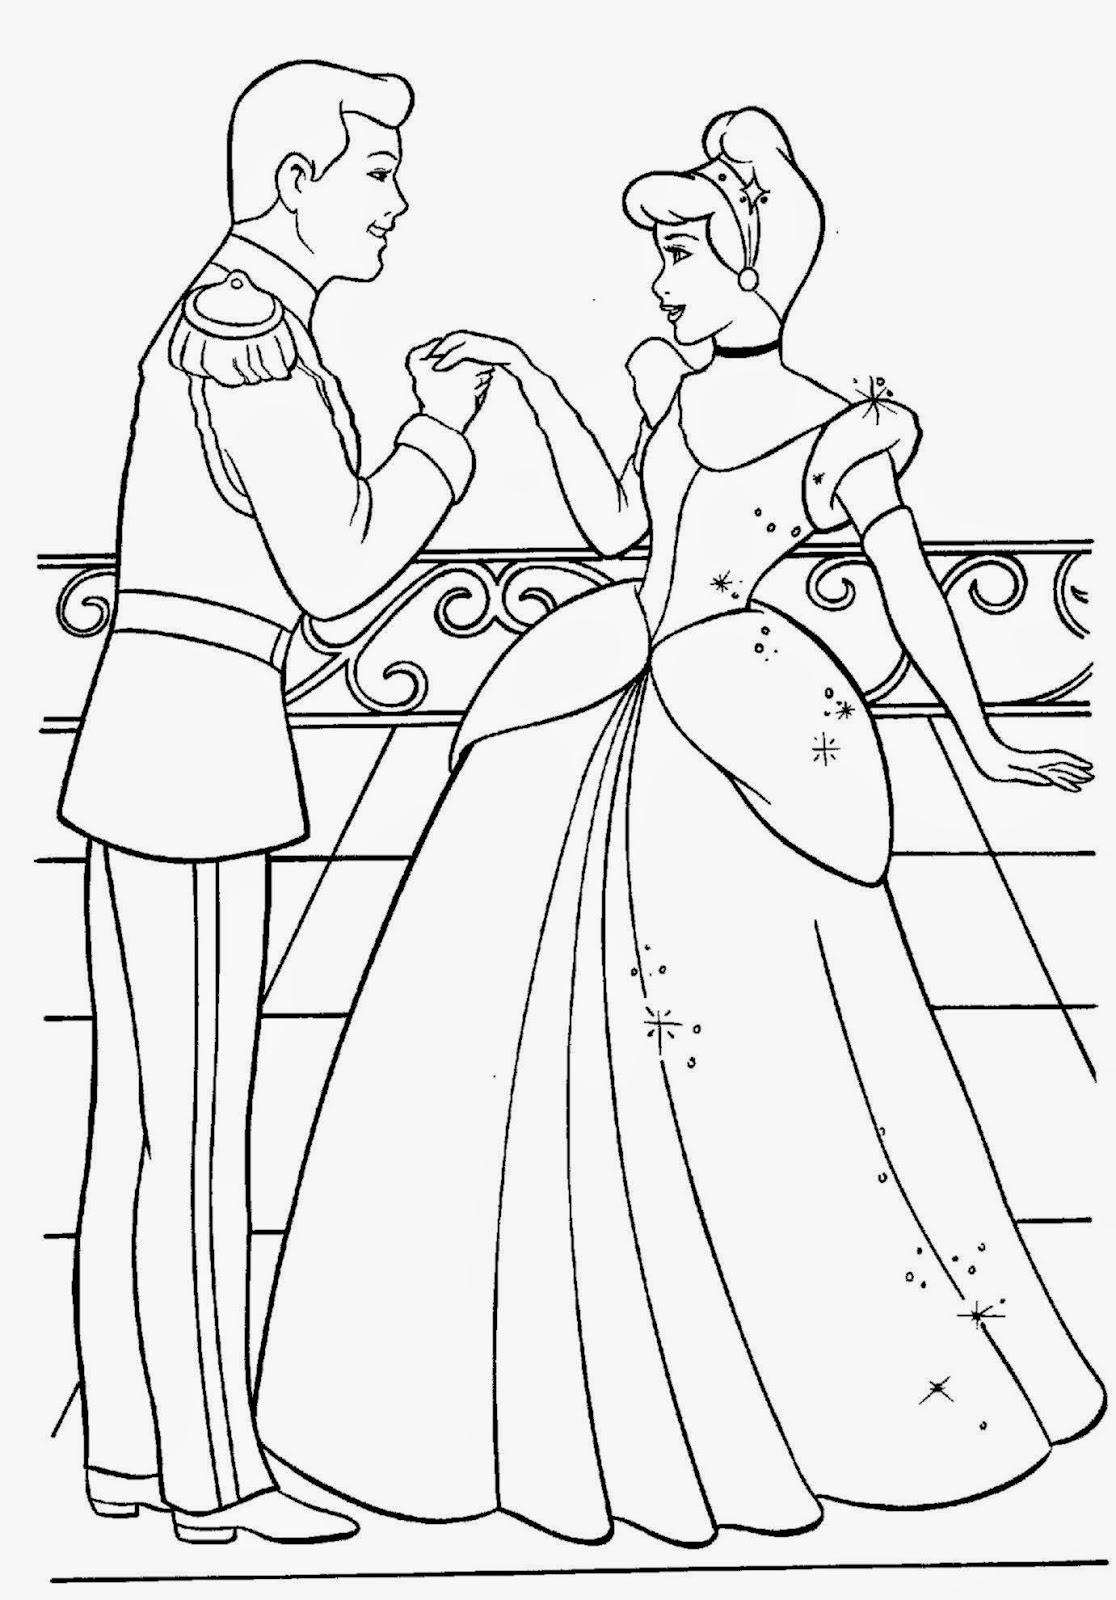 cinderella coloring sheet free coloring sheet